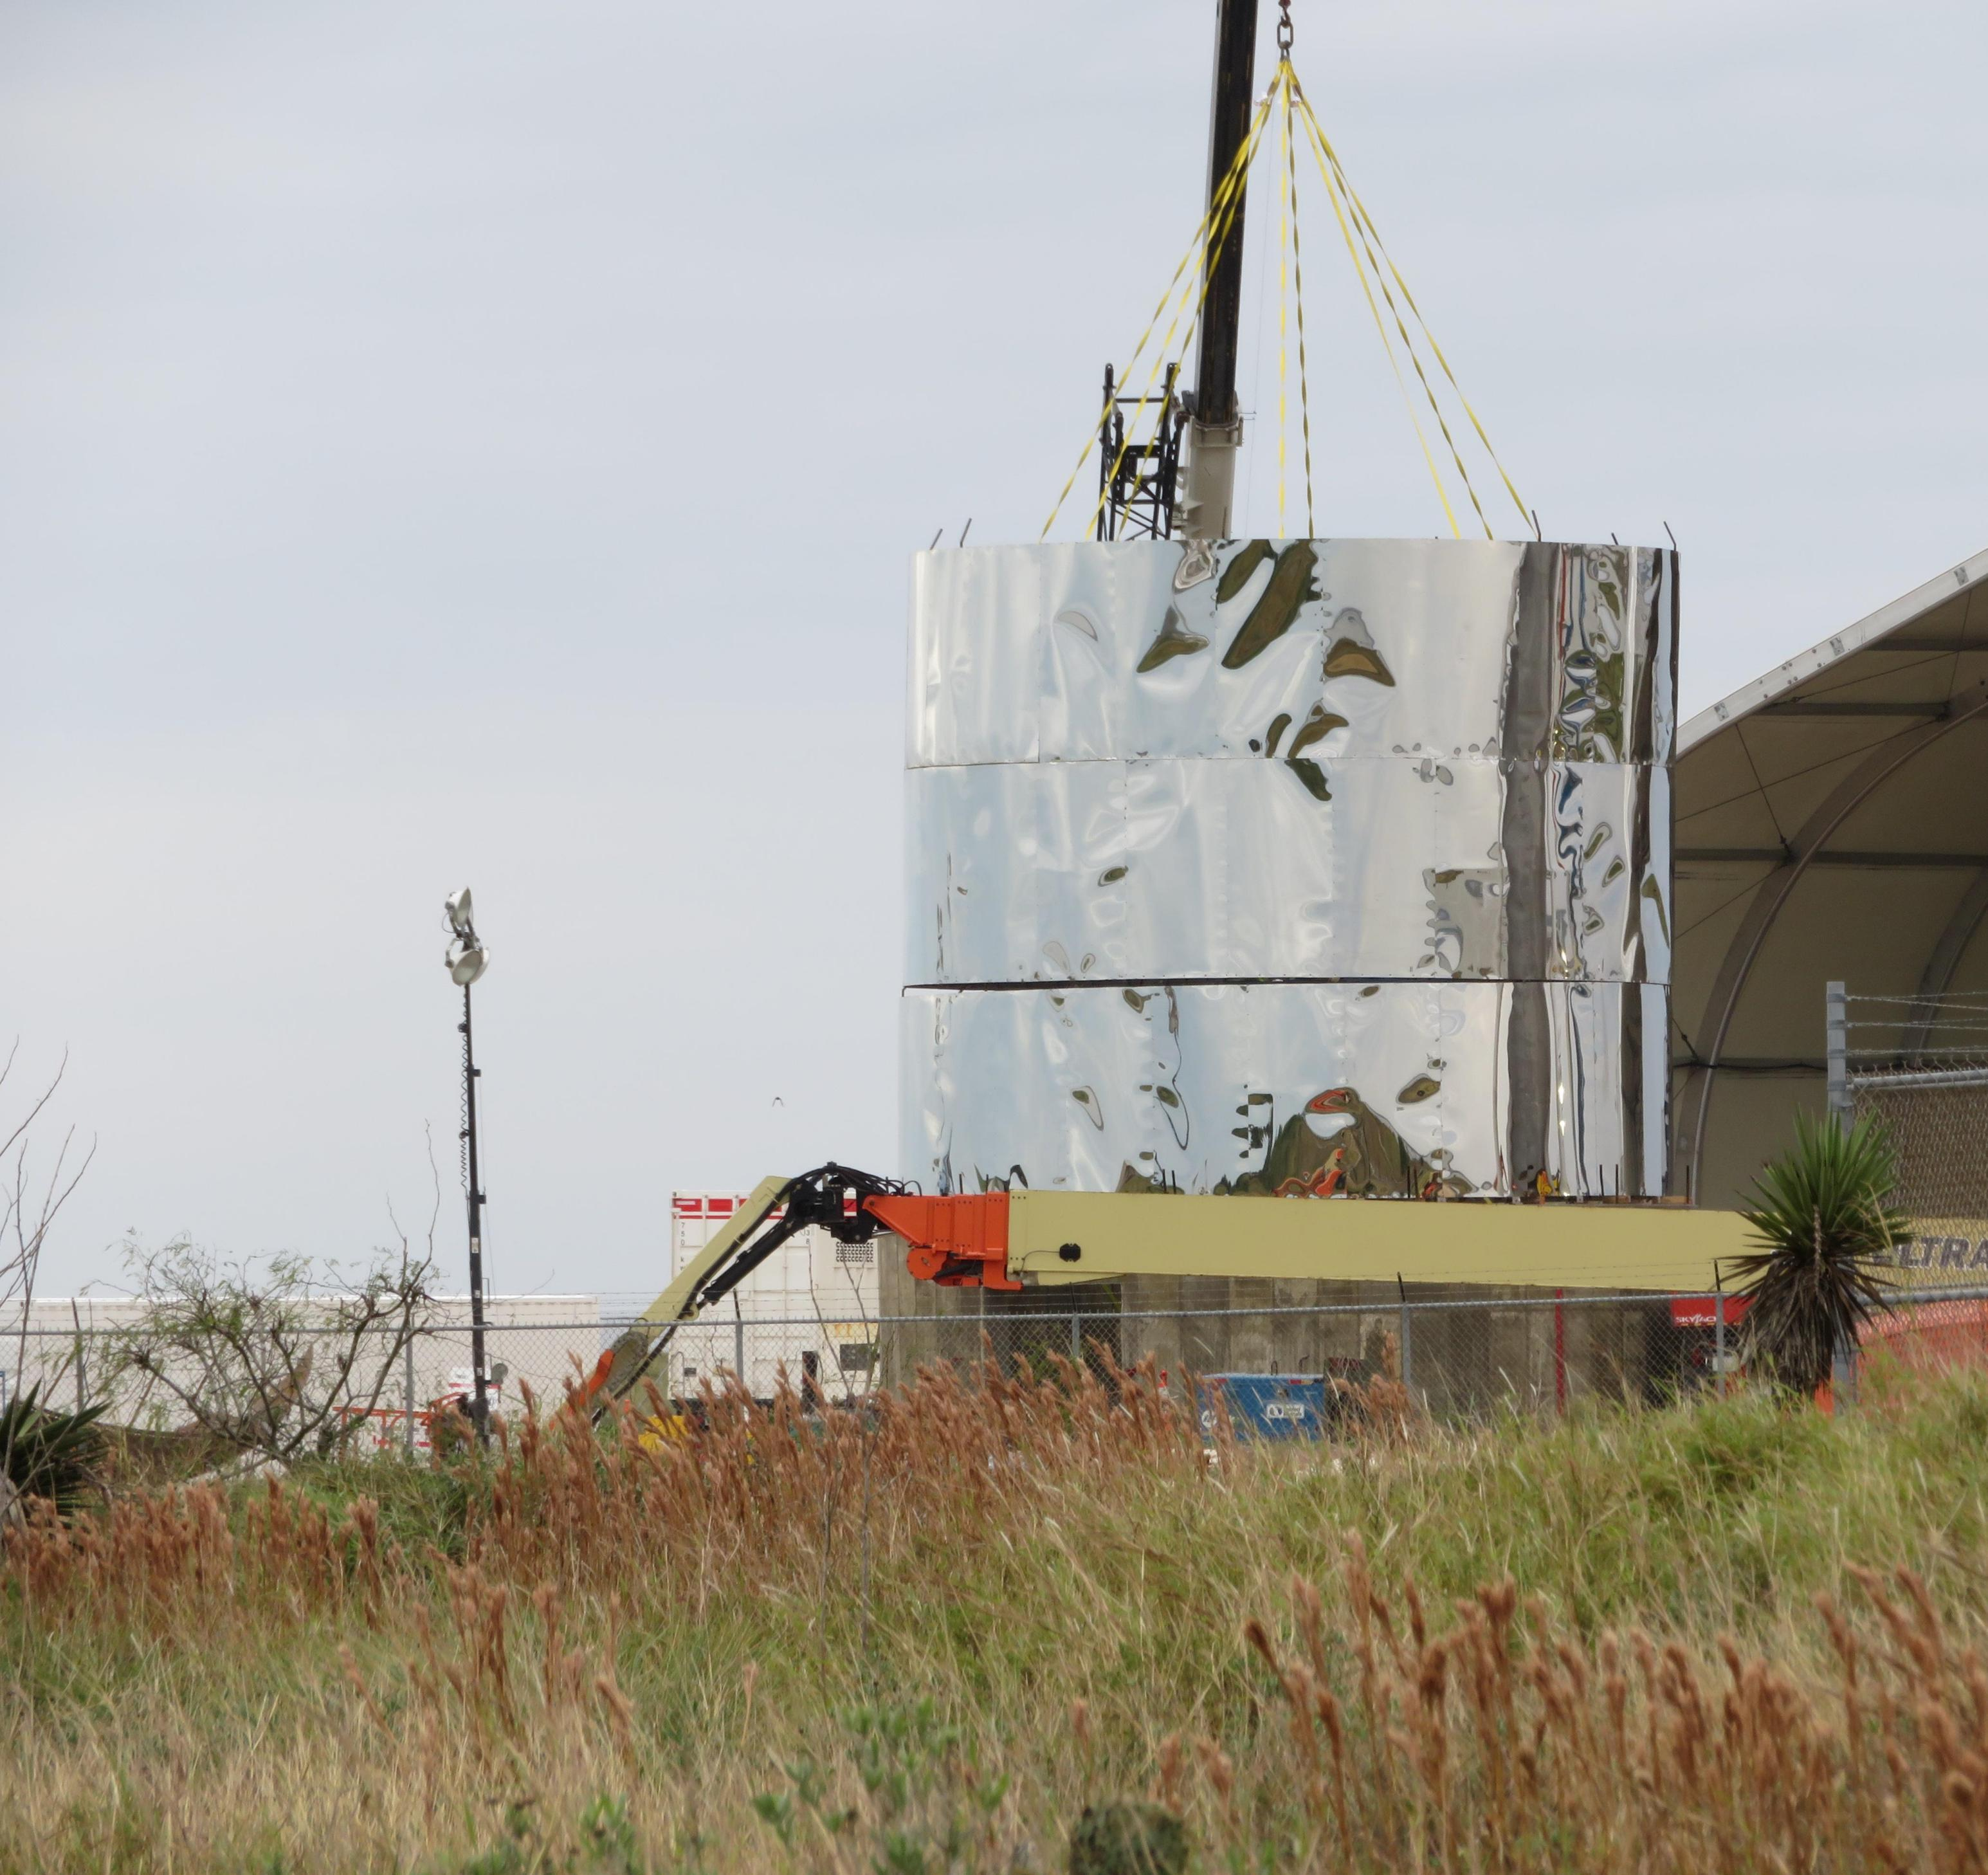 Boca Chica Starship progress 123118 (NSF – bocachicagal) 1(c)